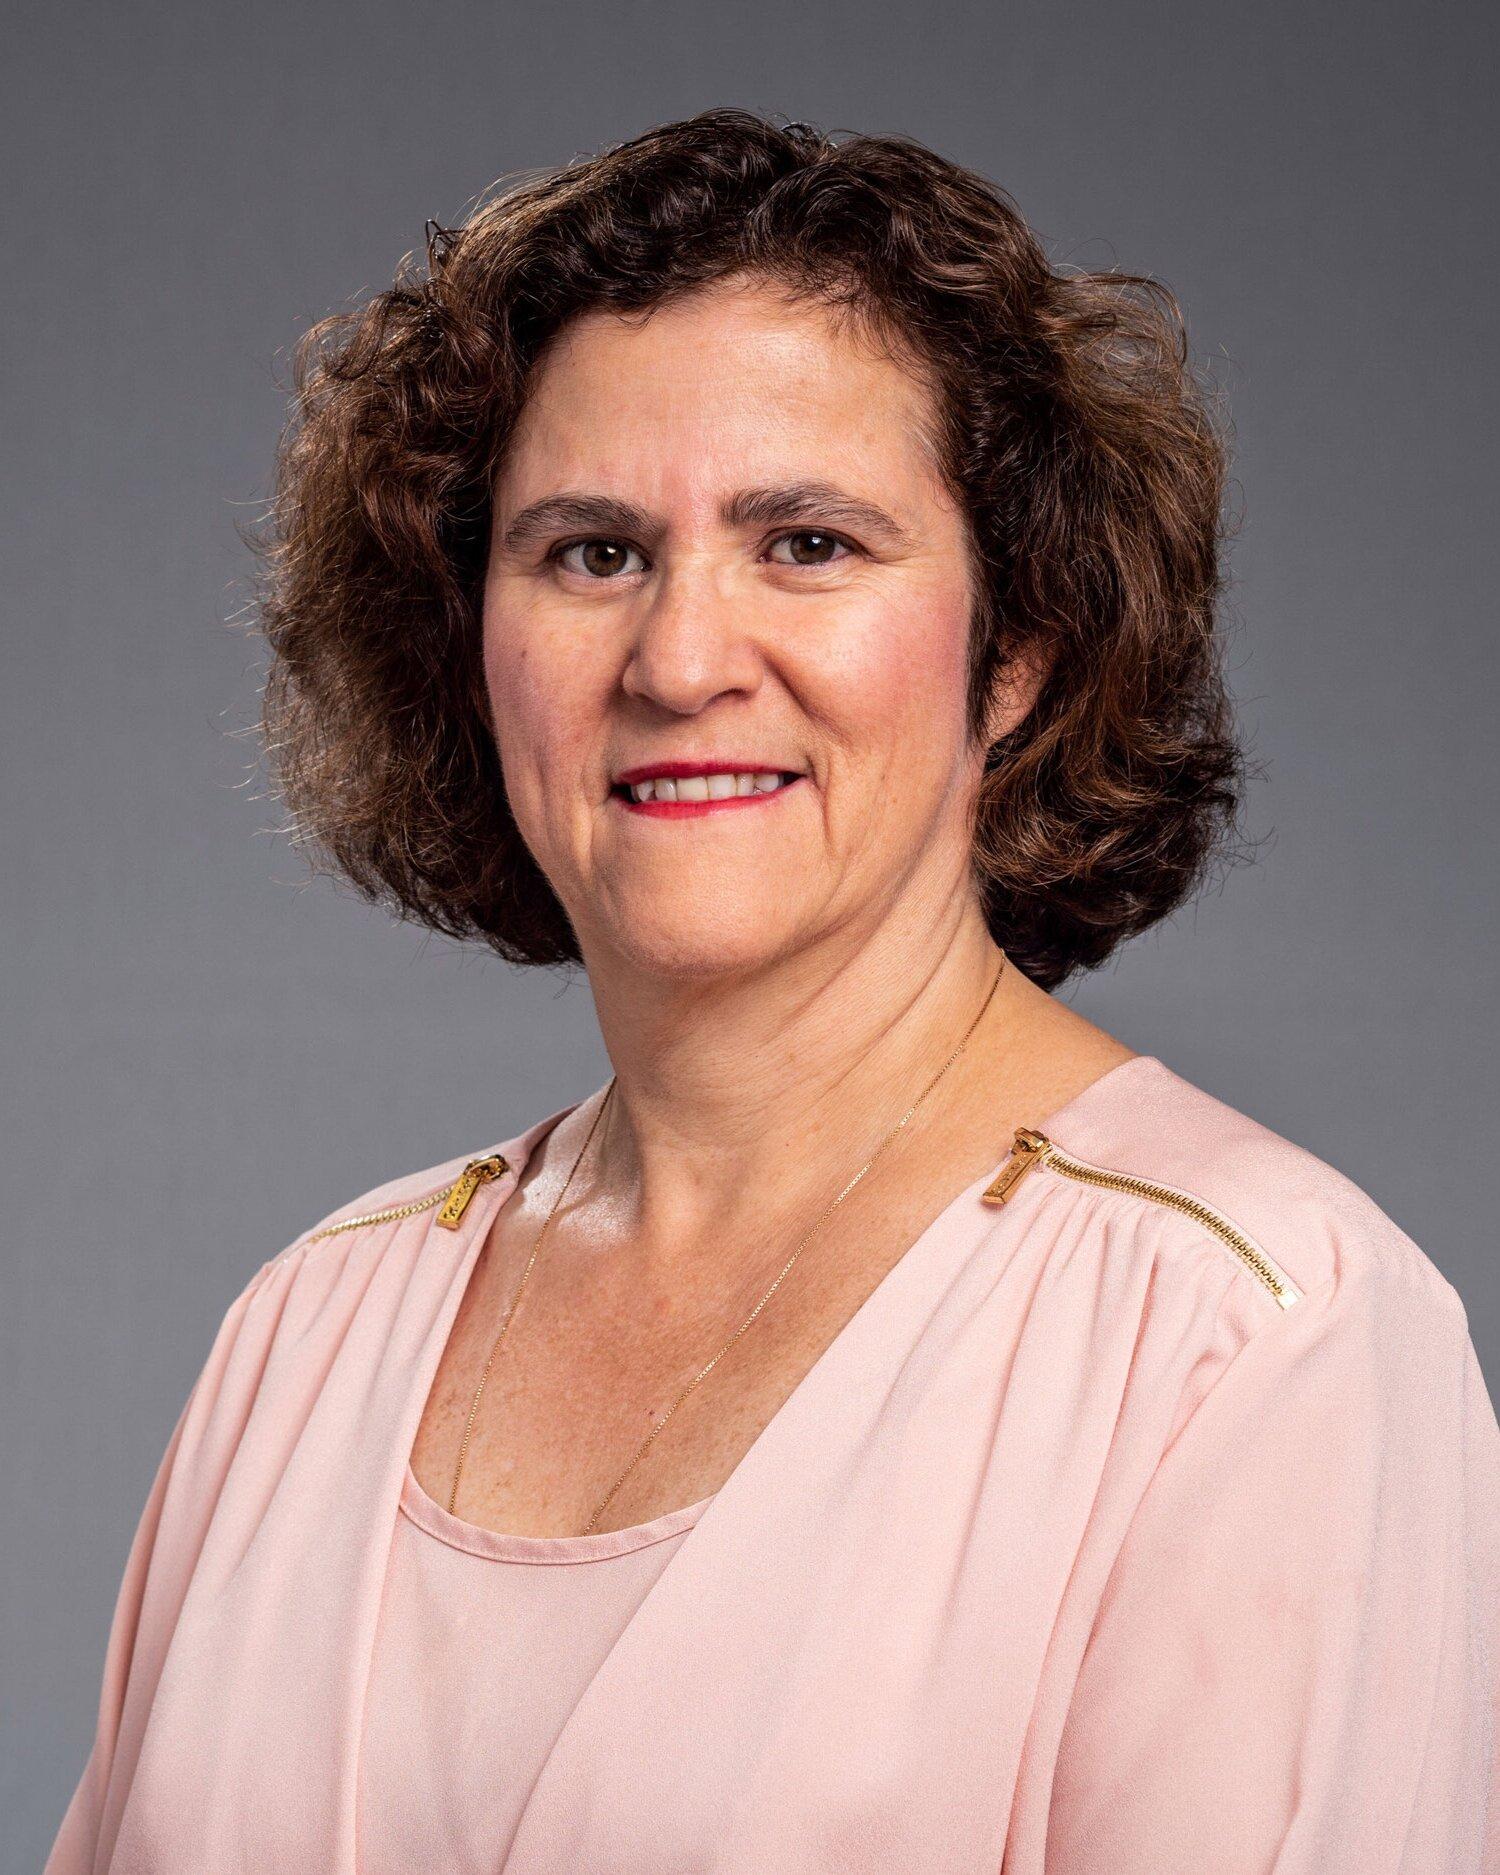 educationGiselle A.Sandi, Ph.D. - Director Office of Rush Mentoring Programs, Faculty Affairs & Associate Professor of Microbial, Pathogens & ImmunityRush University Medical Center